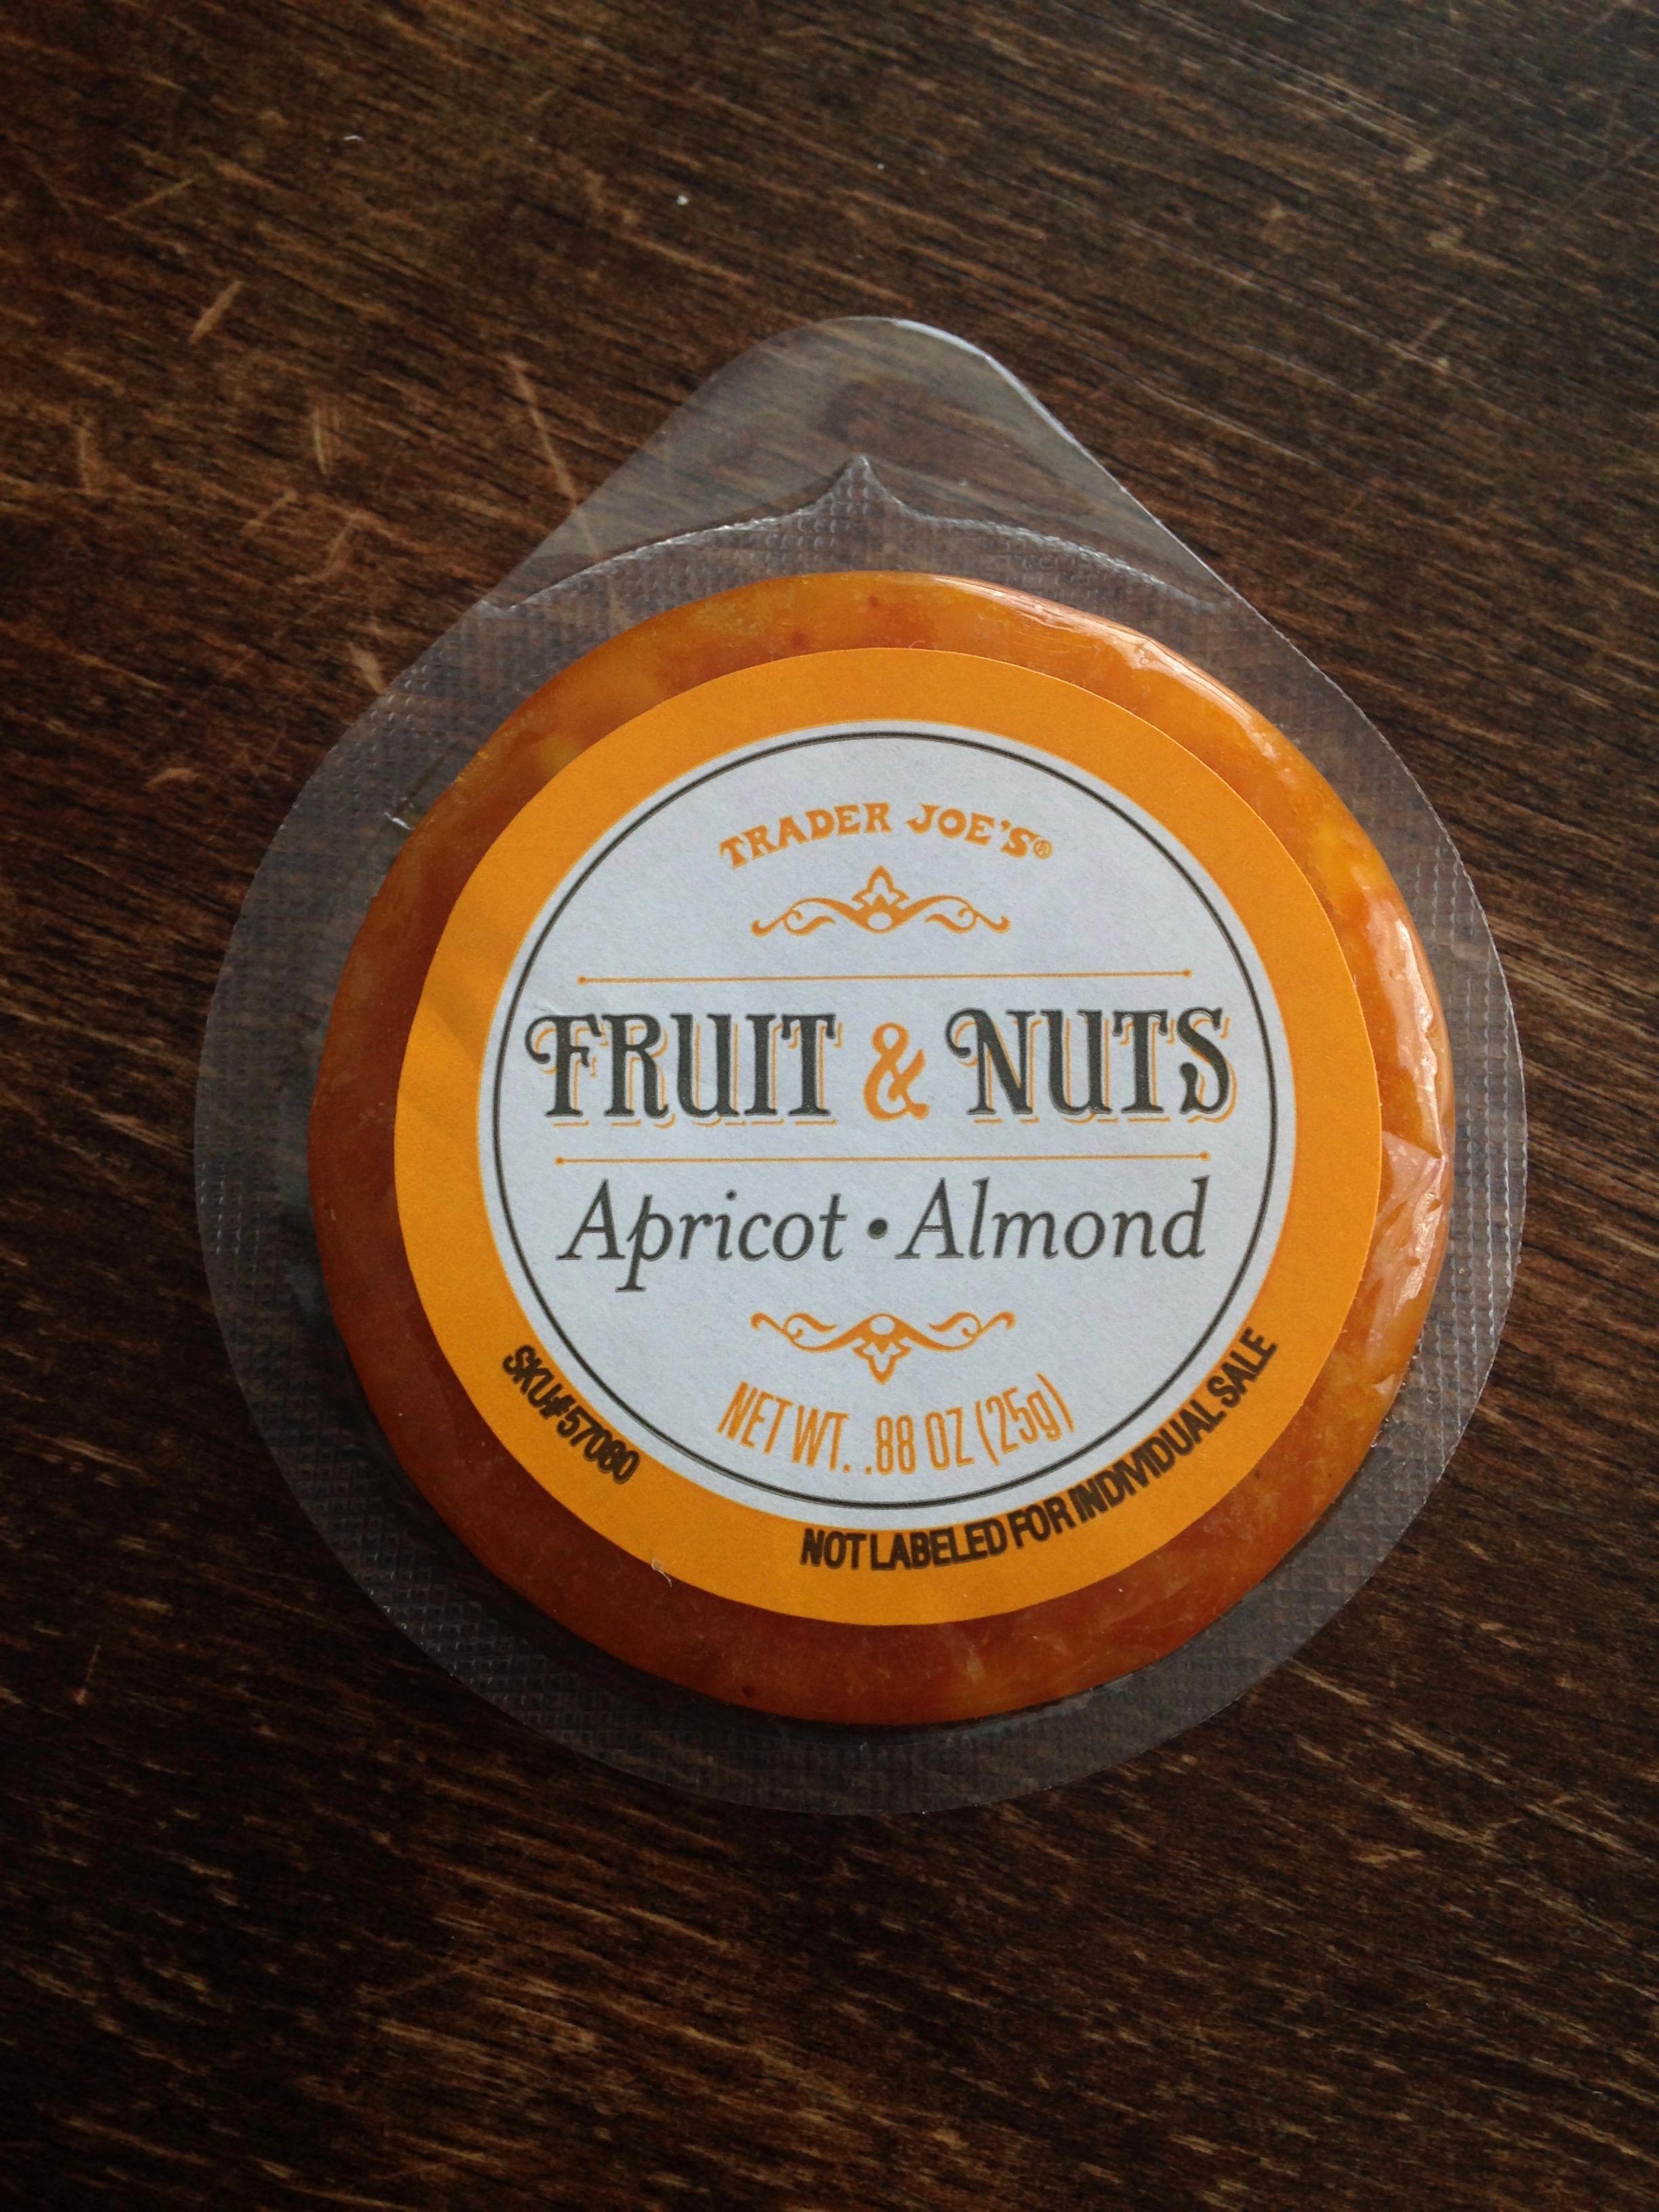 Fruit and Nuts Trader Joe's